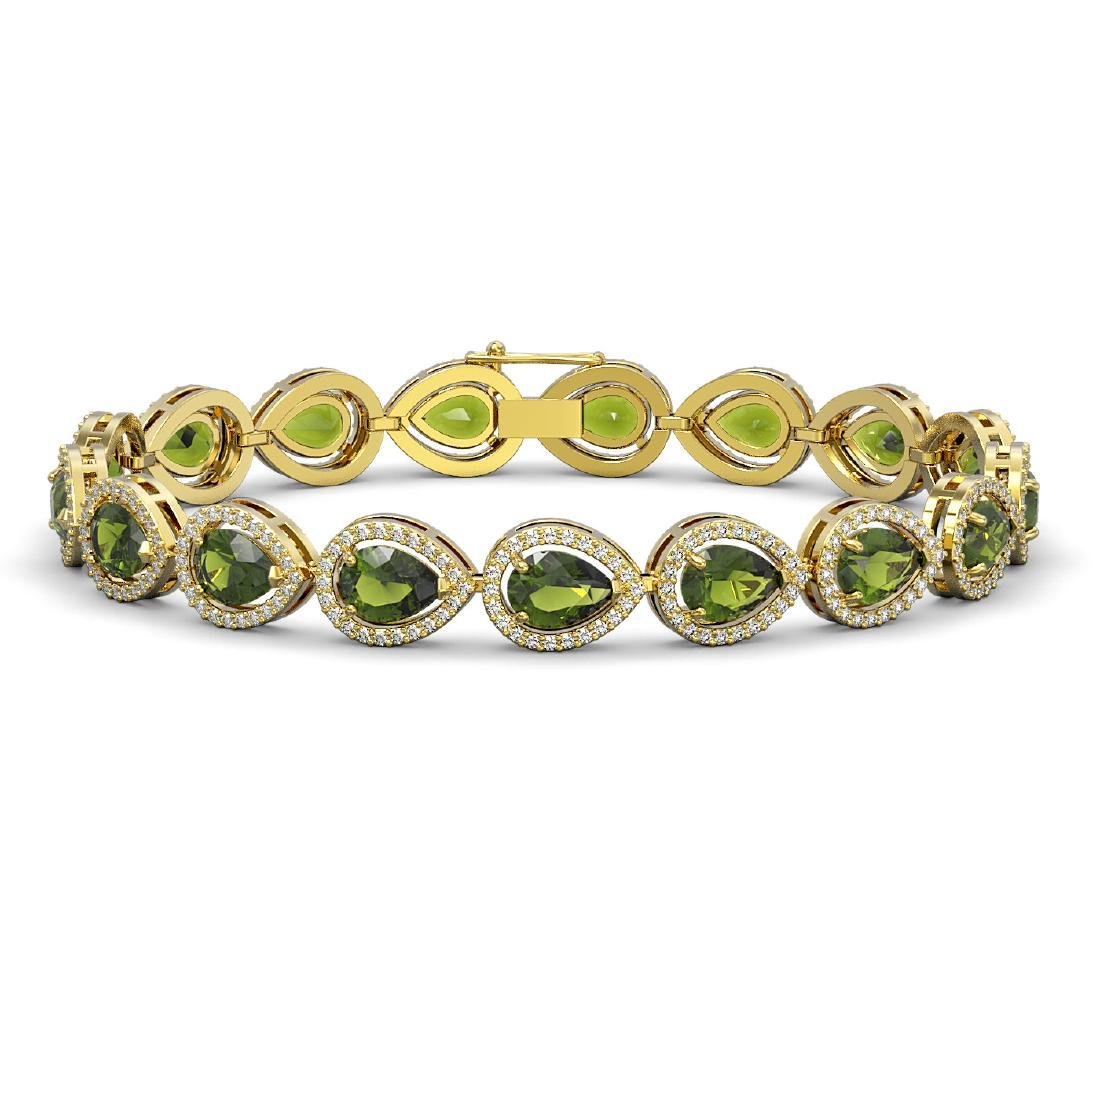 16.93 CTW Tourmaline & Diamond Halo Bracelet 10K Yellow